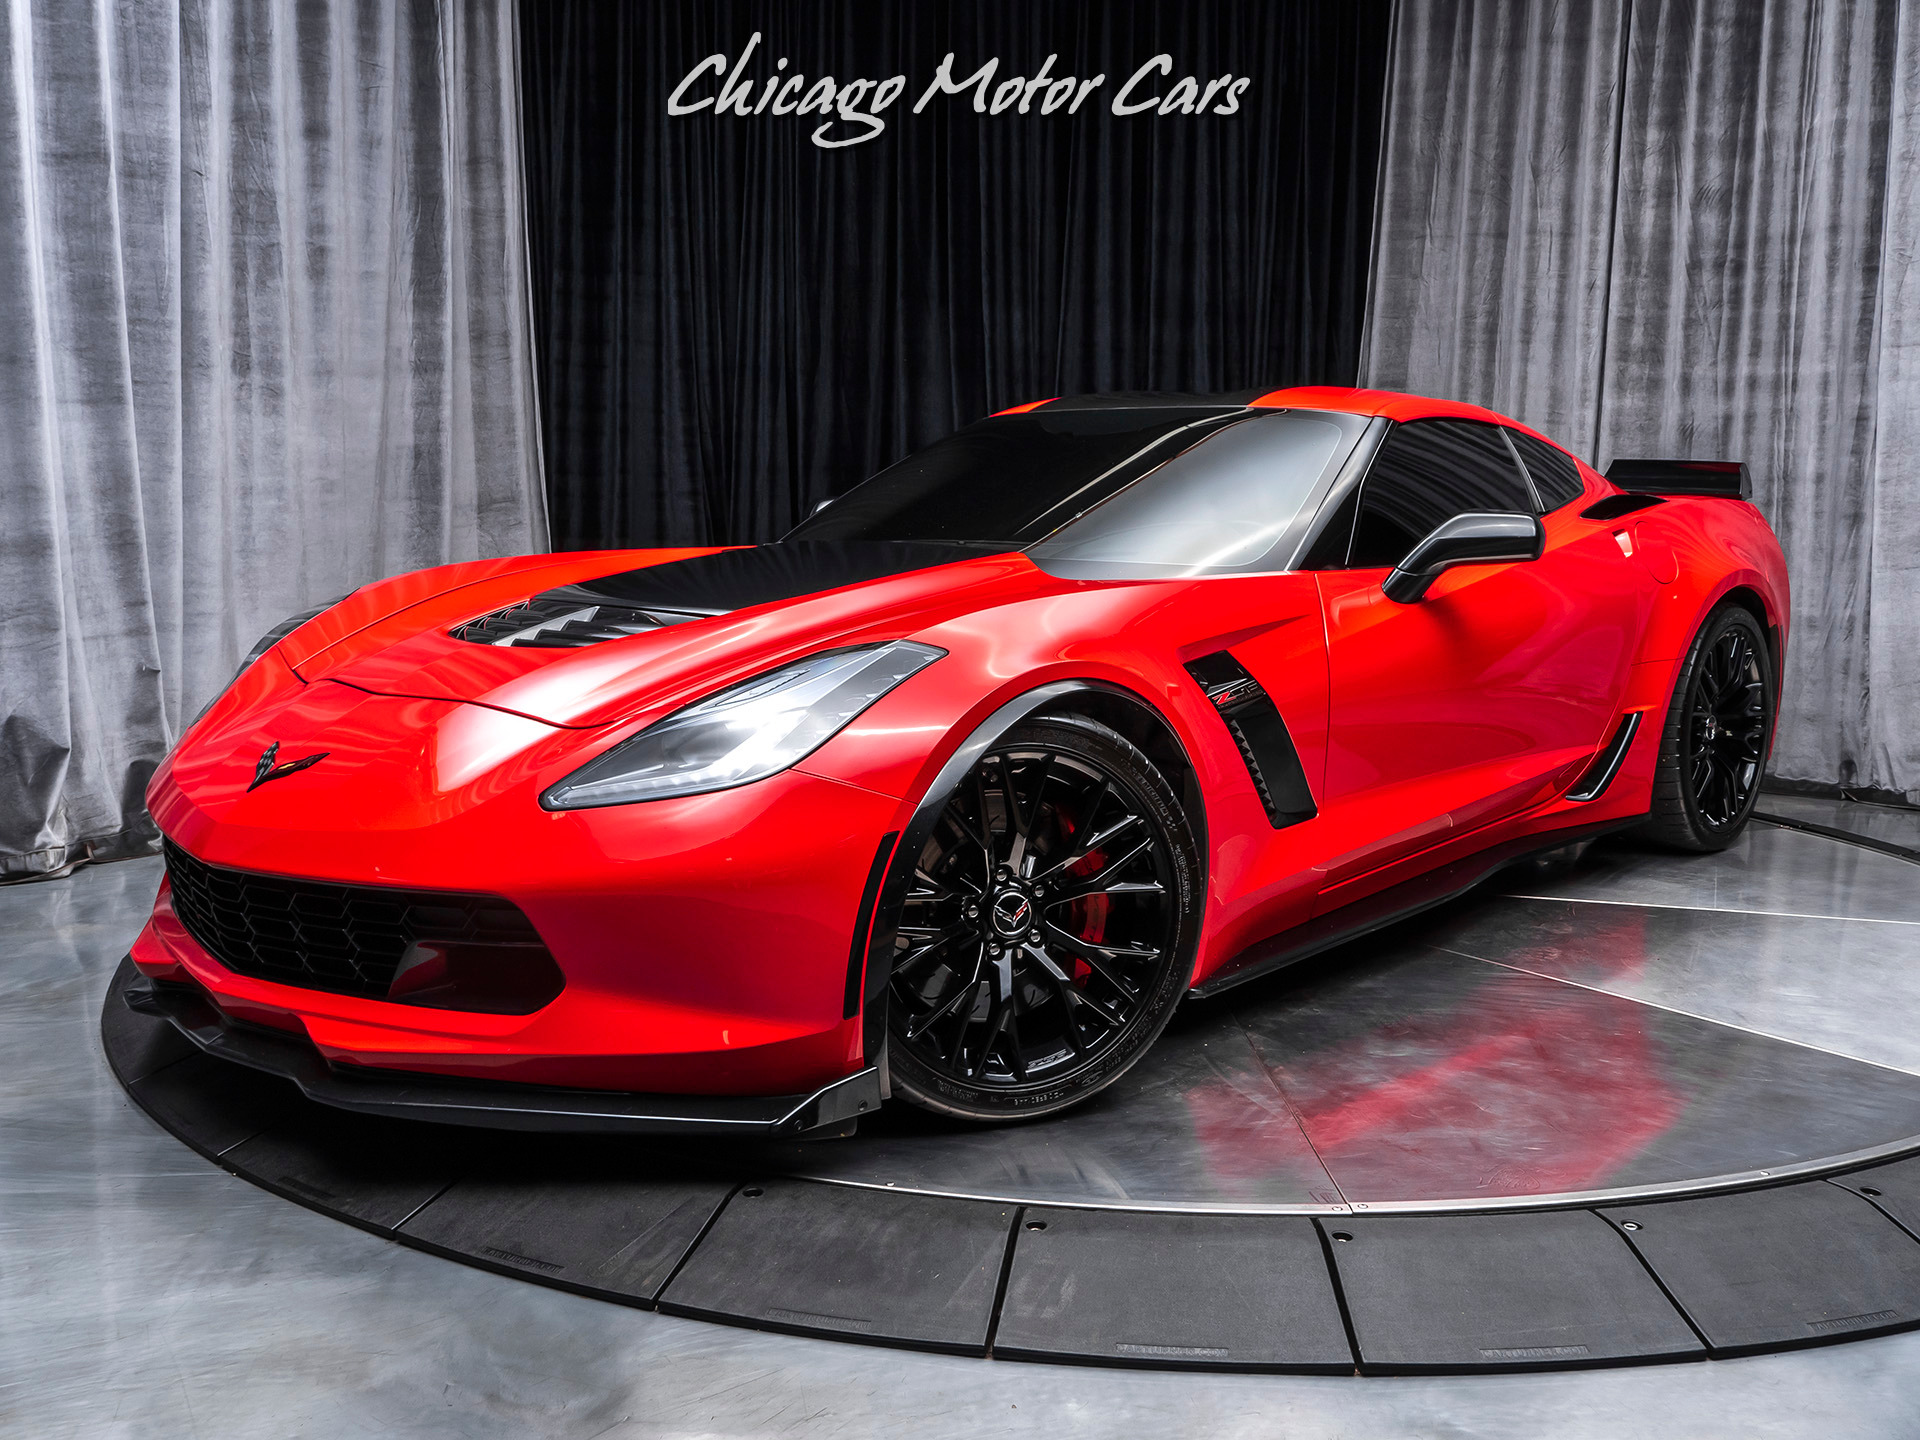 2015 Chevrolet Corvette Z06 3lz Msrp 97 060 Chicago Motor Cars Inc Official Corporate Website For Chicago Motor Cars